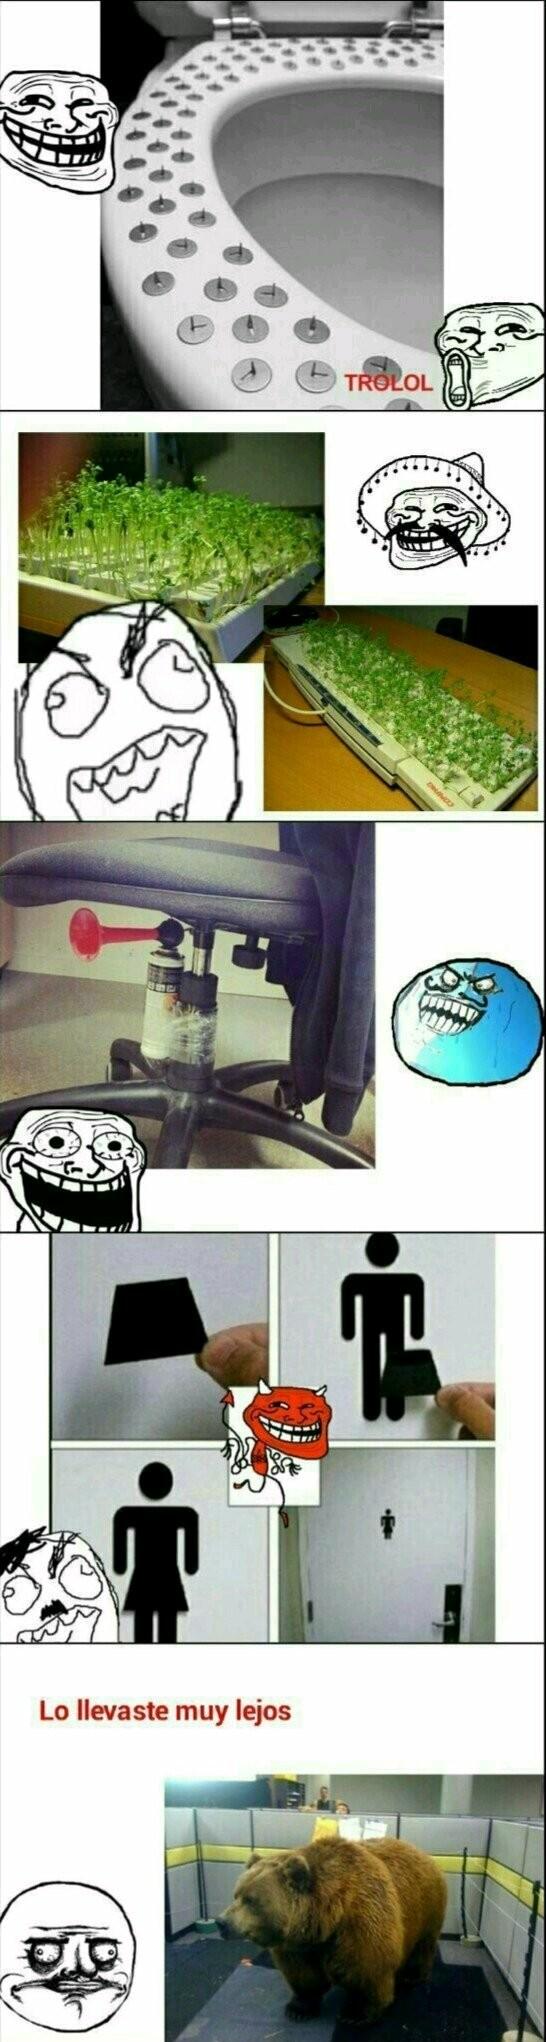 Ideas de bromas - meme